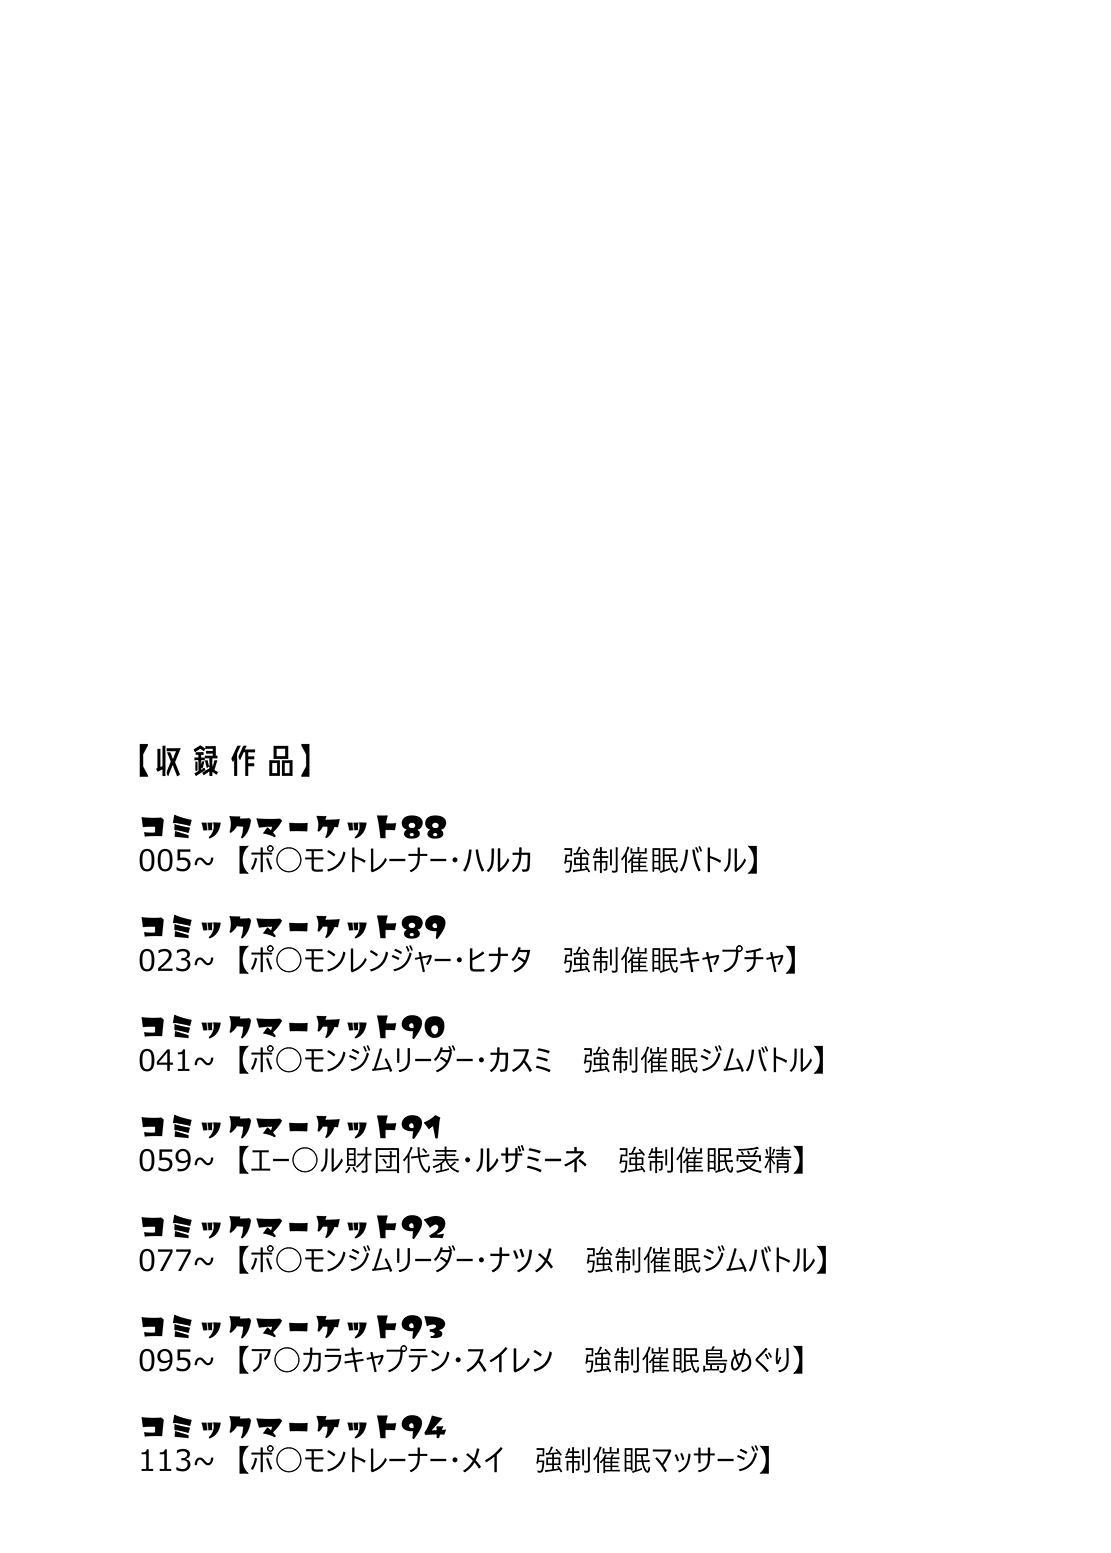 [Stapspats (Hisui)] Stapspats [Pocket Monster Saimin Series Soushuuhen] 1 Collective Hypnosis (Pokémon) [Digital] 2